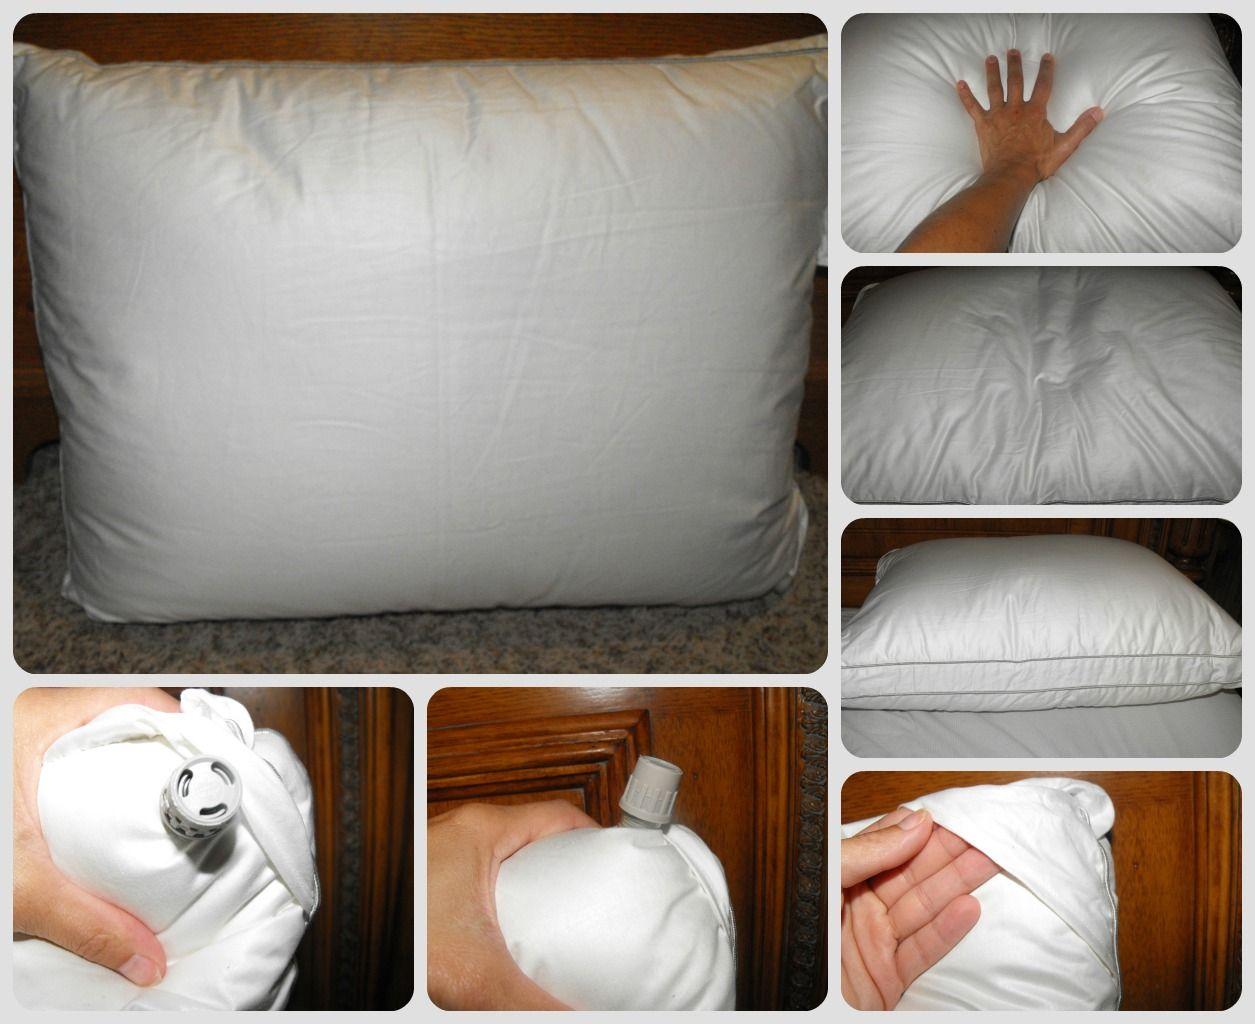 Sleep Number AirFit Adjustable Pillow Review   Fun Saving Money